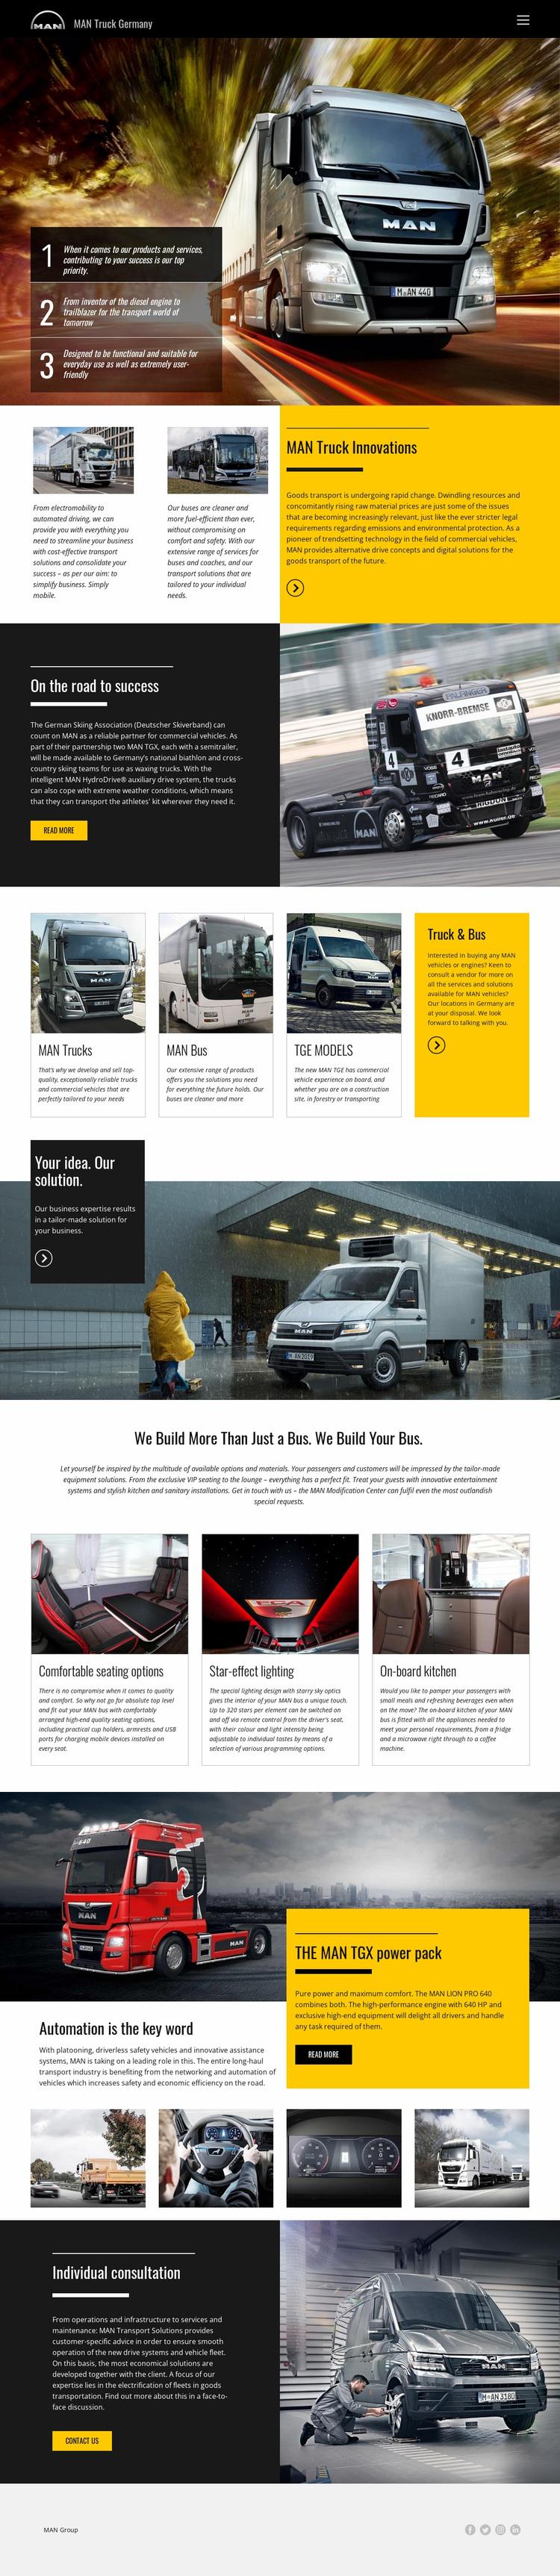 Man trucks for transportation Website Design